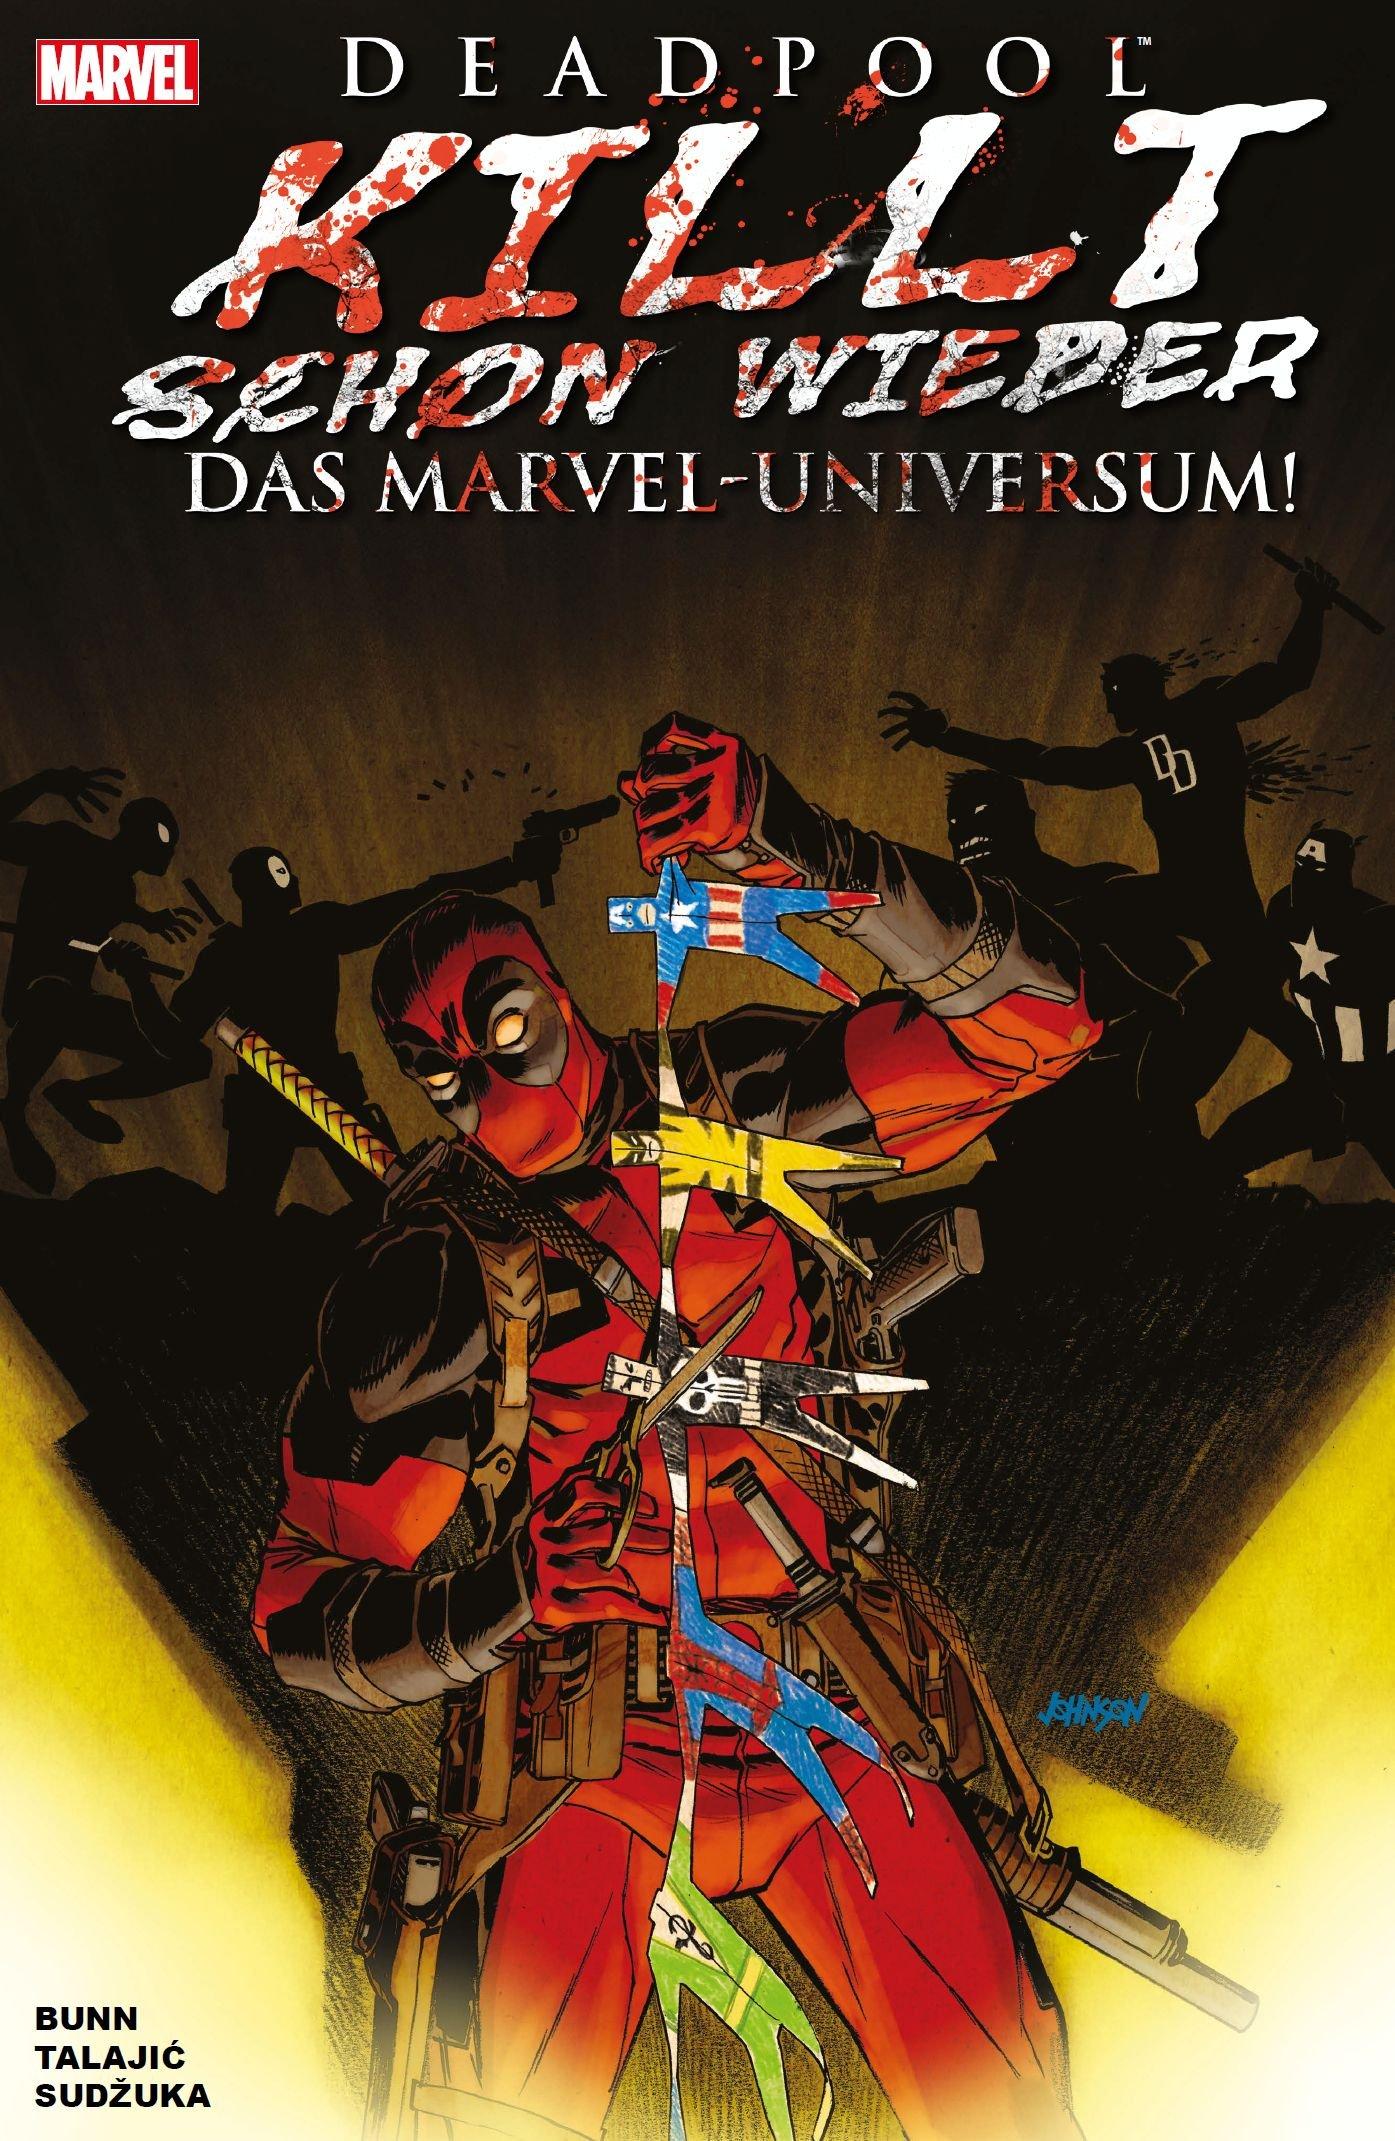 deadpool-killt-schon-wieder-das-marvel-universum